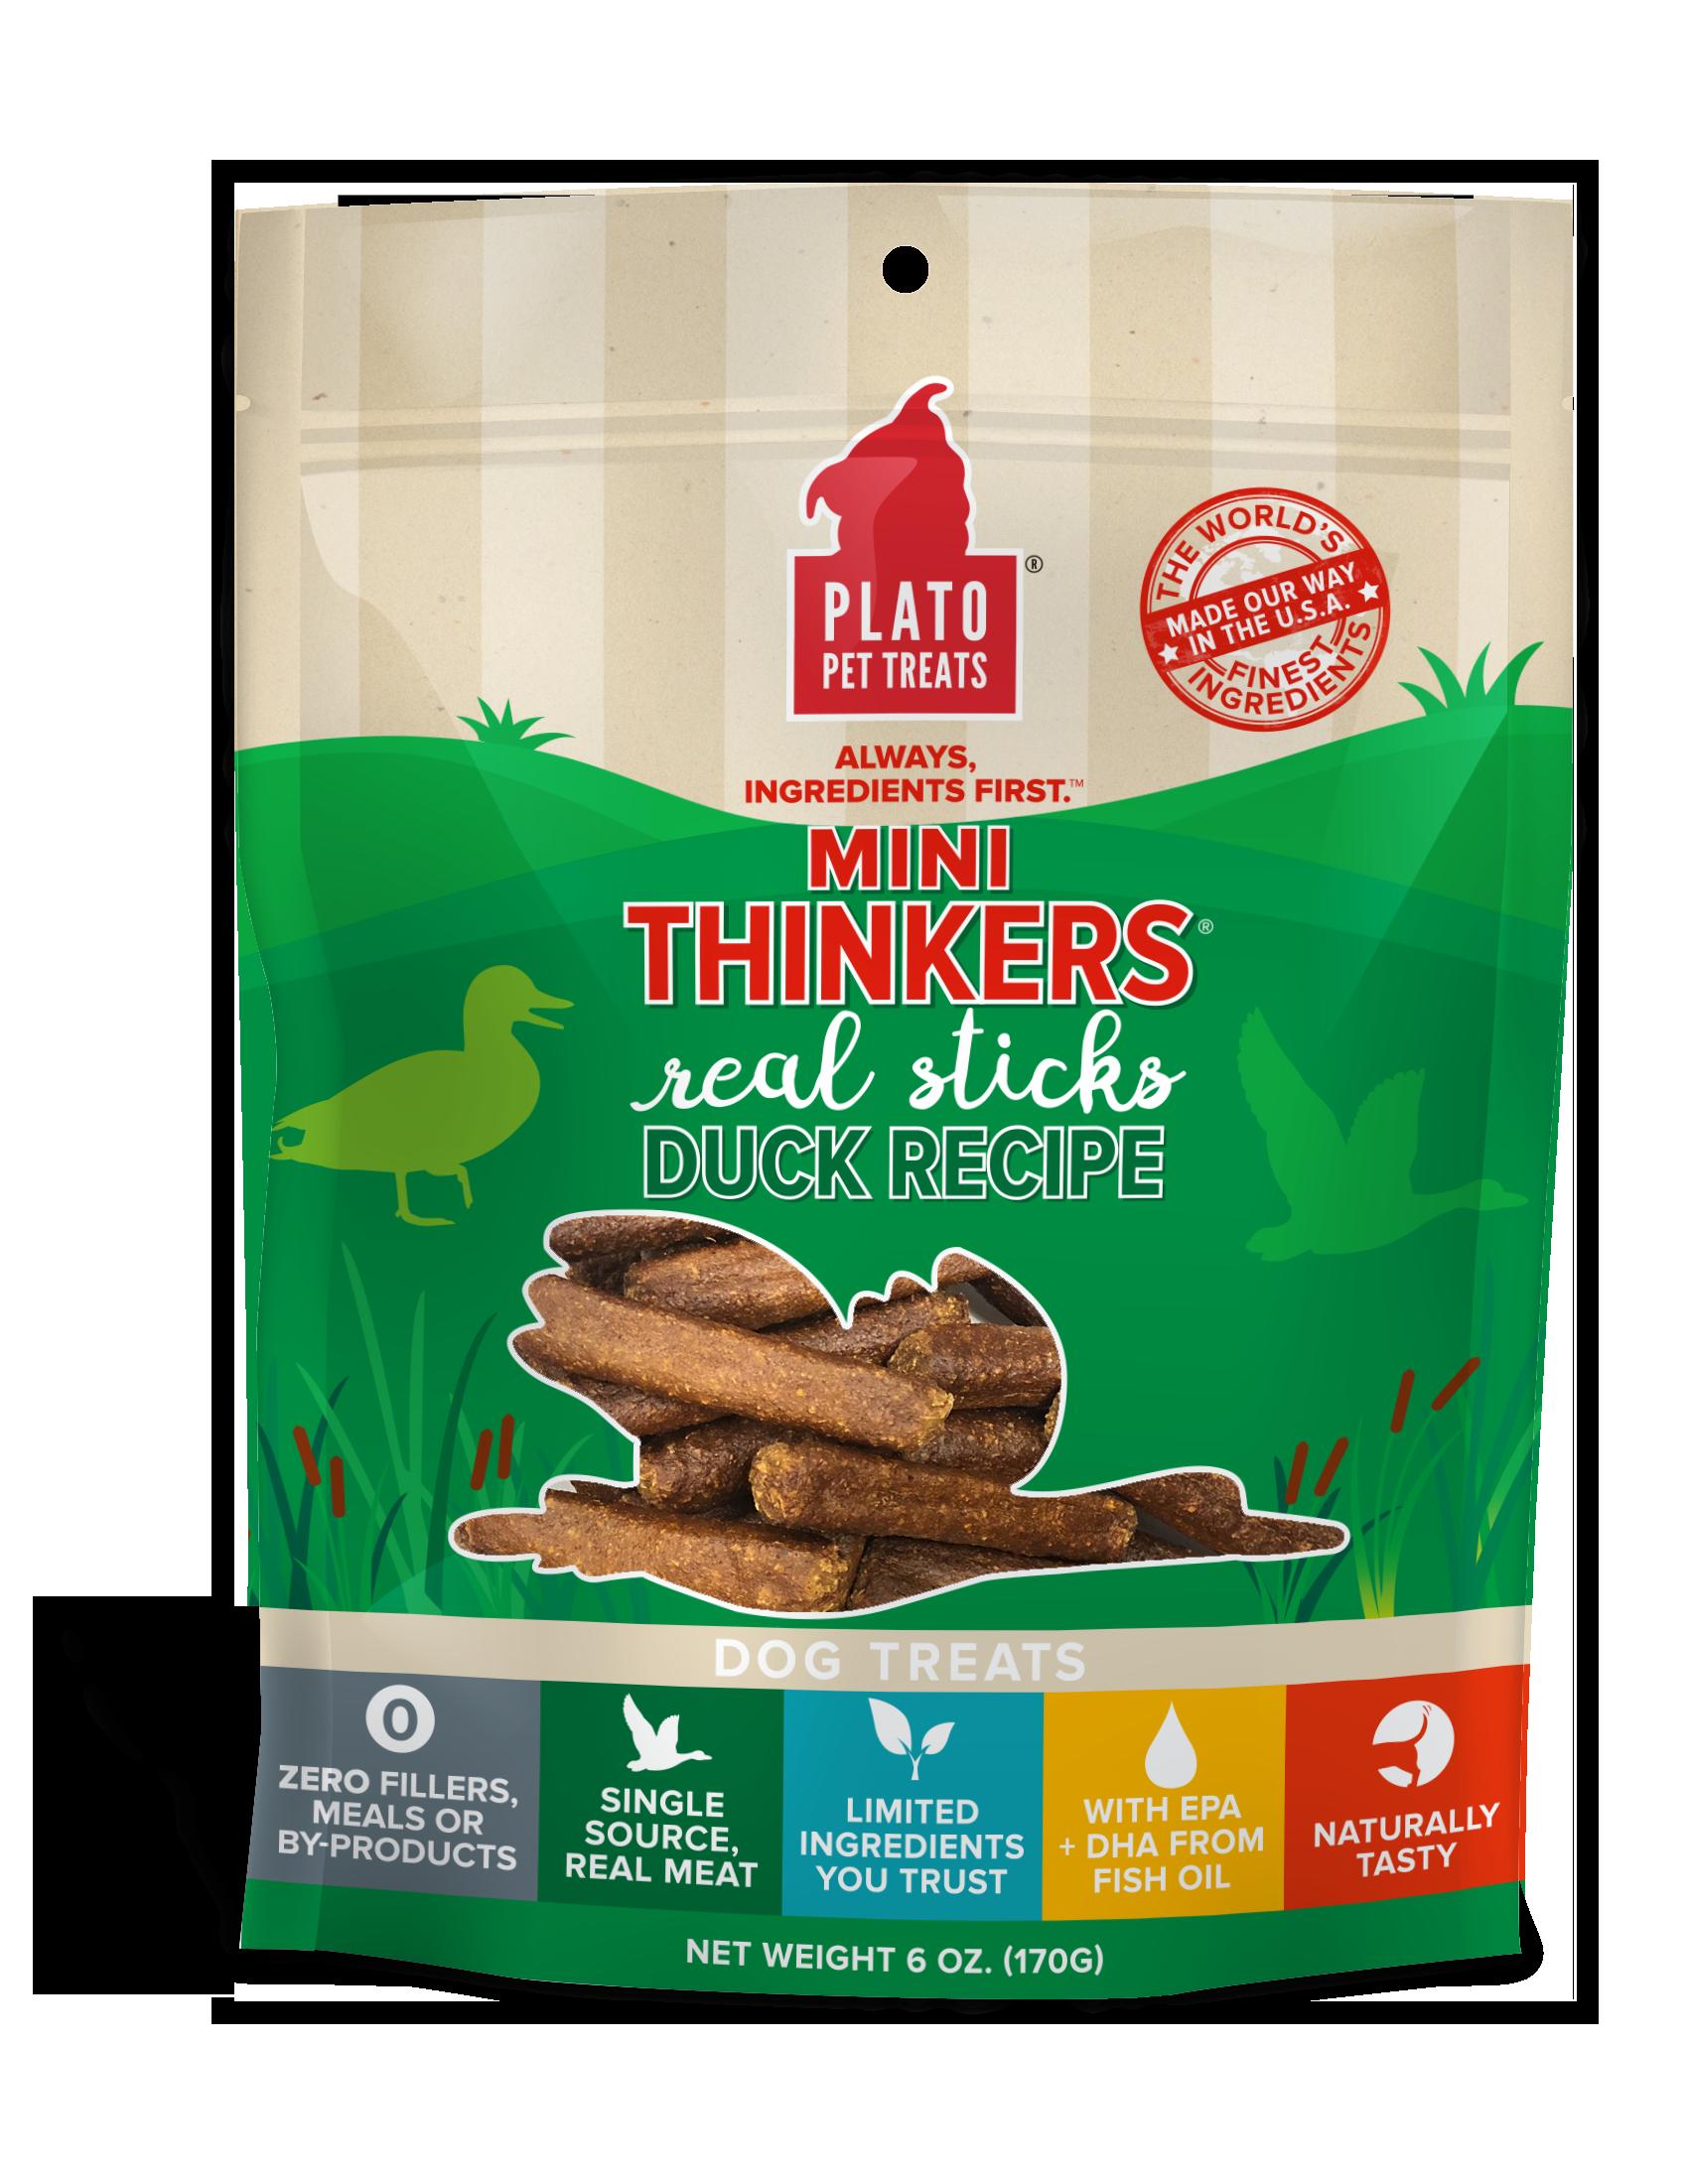 Plato Pet Treats Mini Thinkers Duck Meat Stick Dog Treats Image